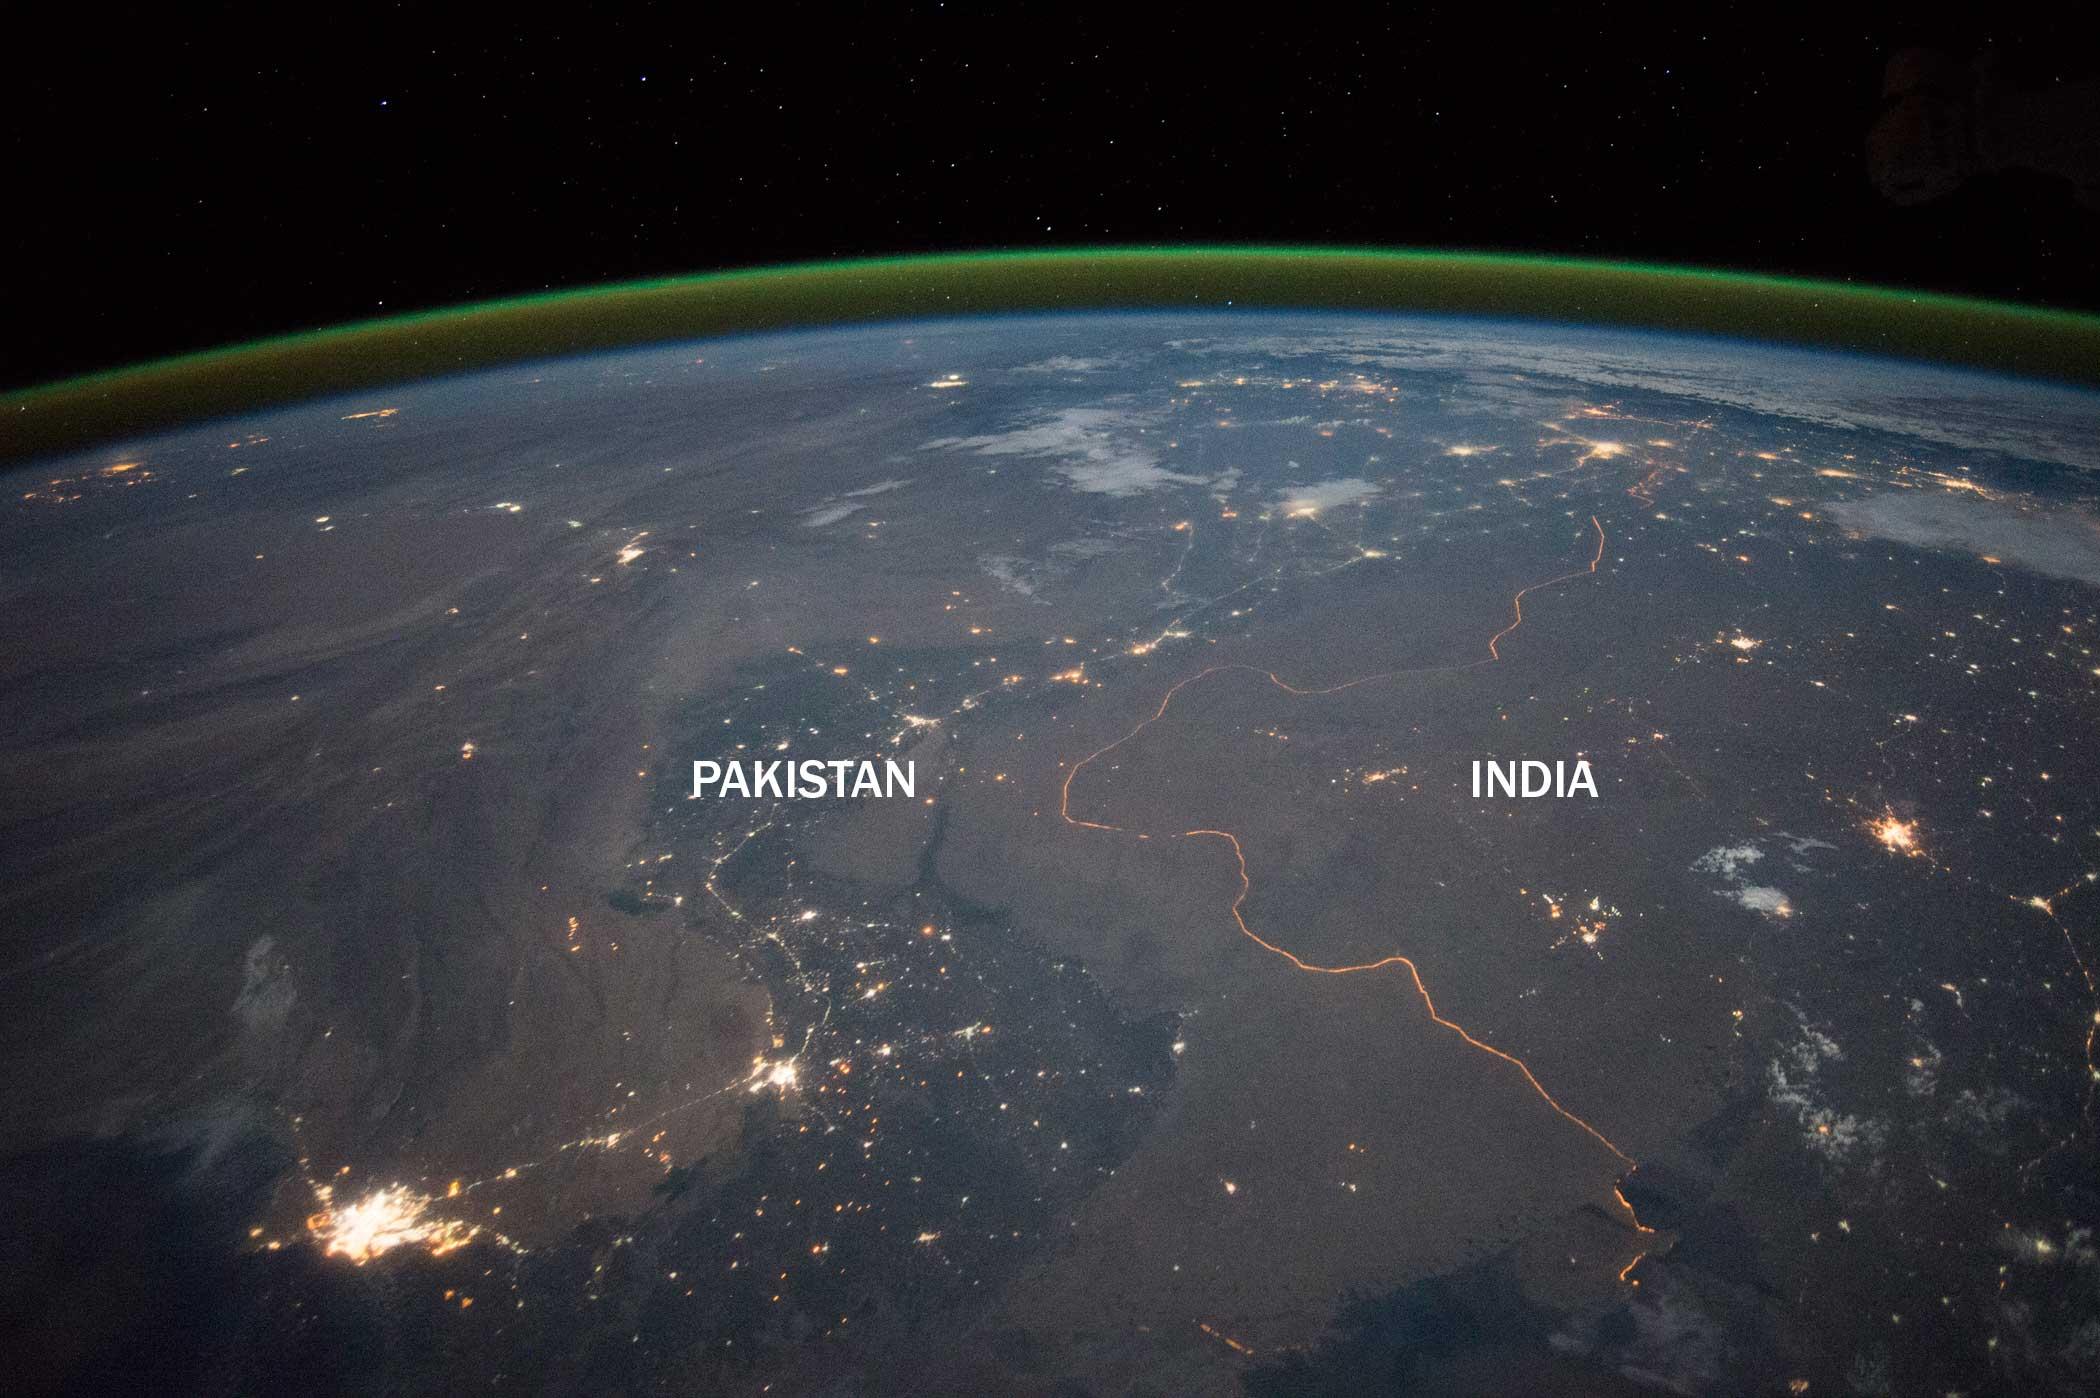 https://earthobservatory.nasa.gov/IOTD/view.php?id=86725